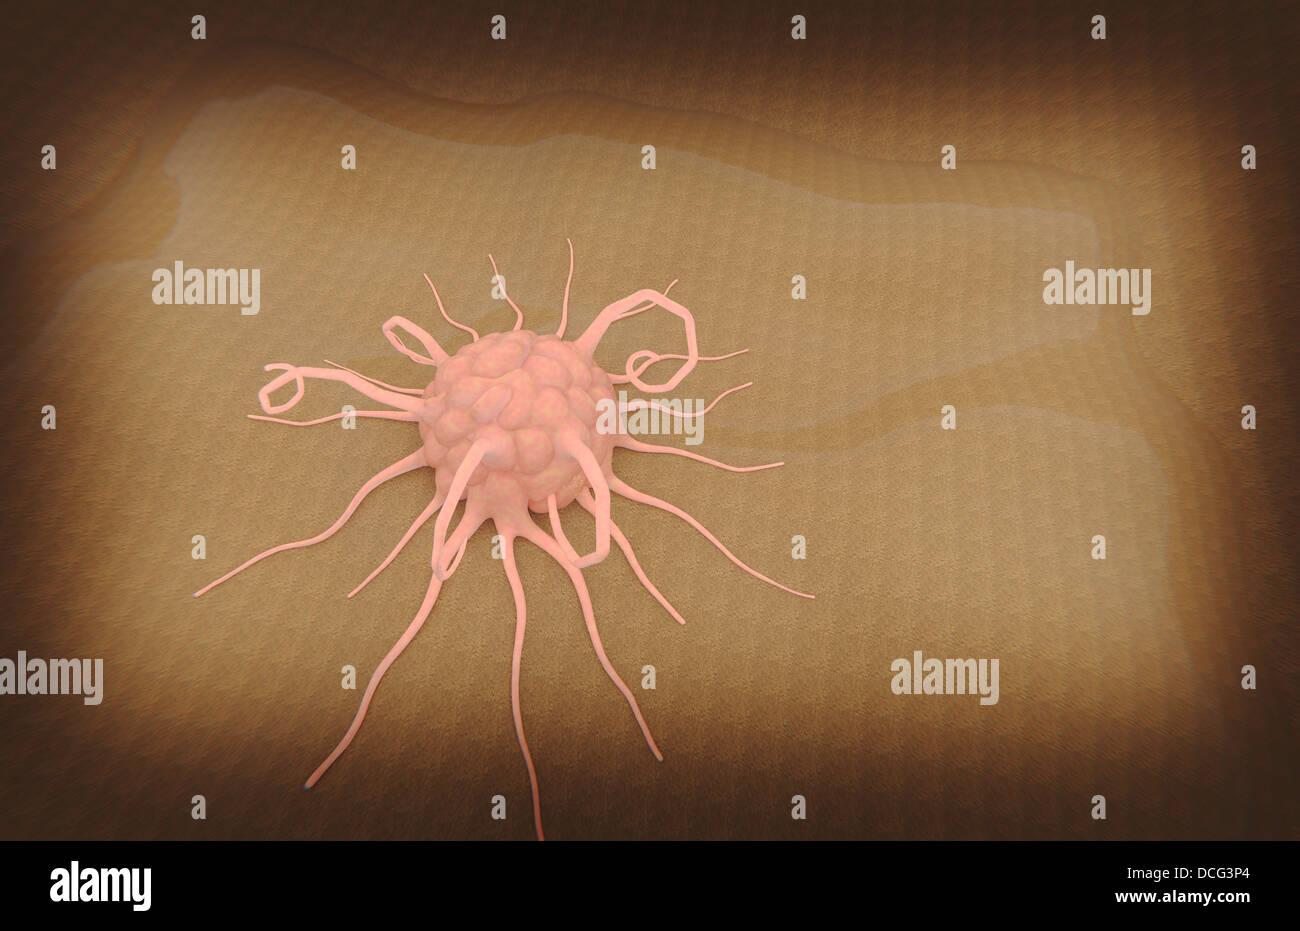 3D rendering of macrophage phagocytosis. - Stock Image